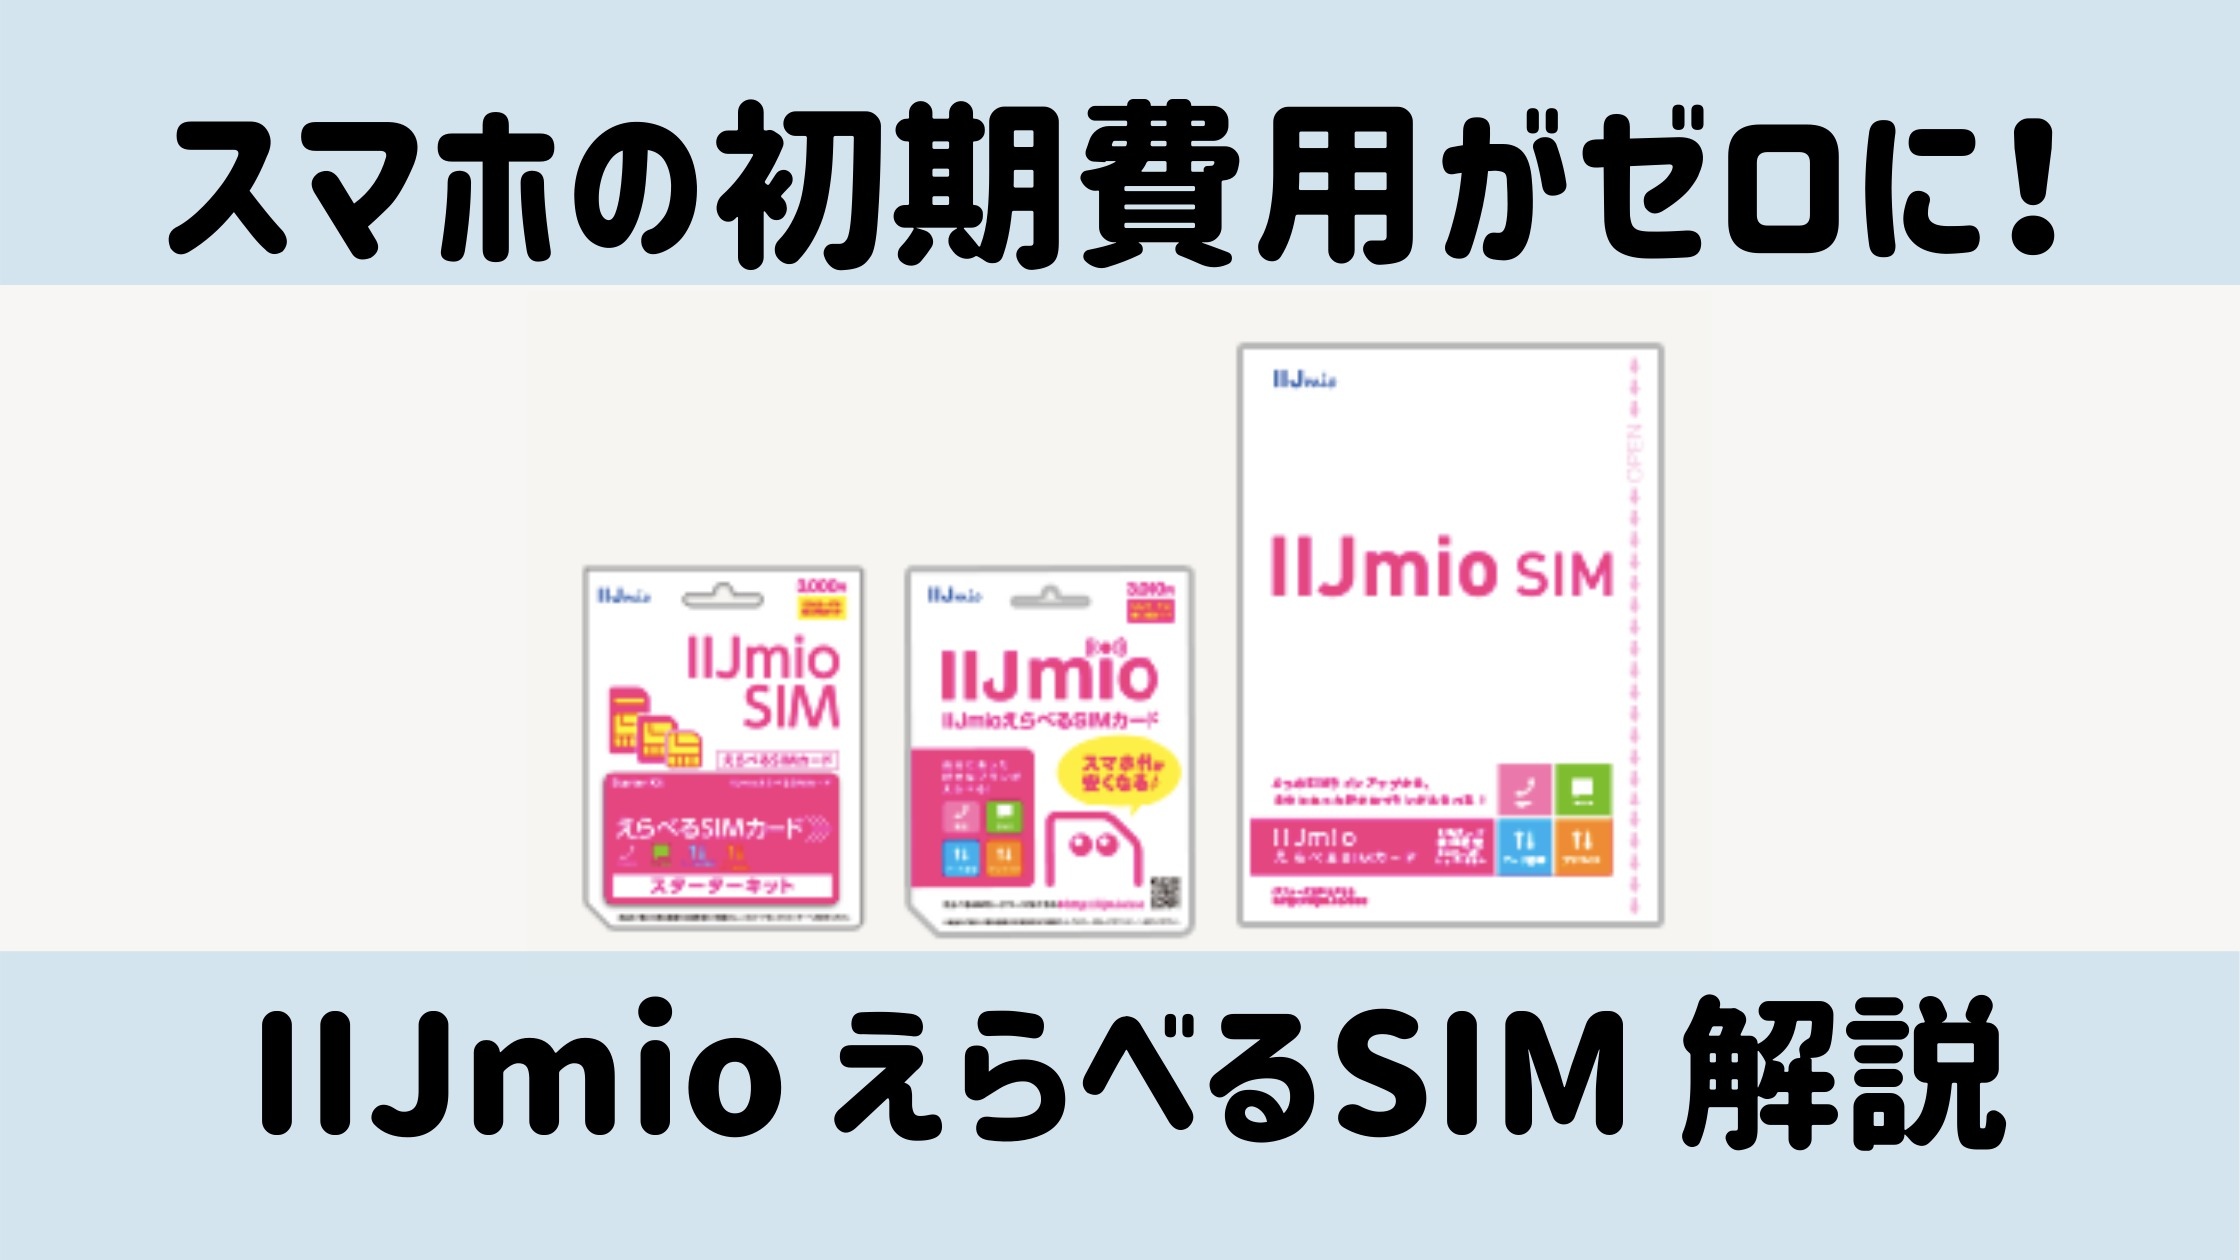 IIJmio スマホ SIM 格安 Amazon 手数料 無料